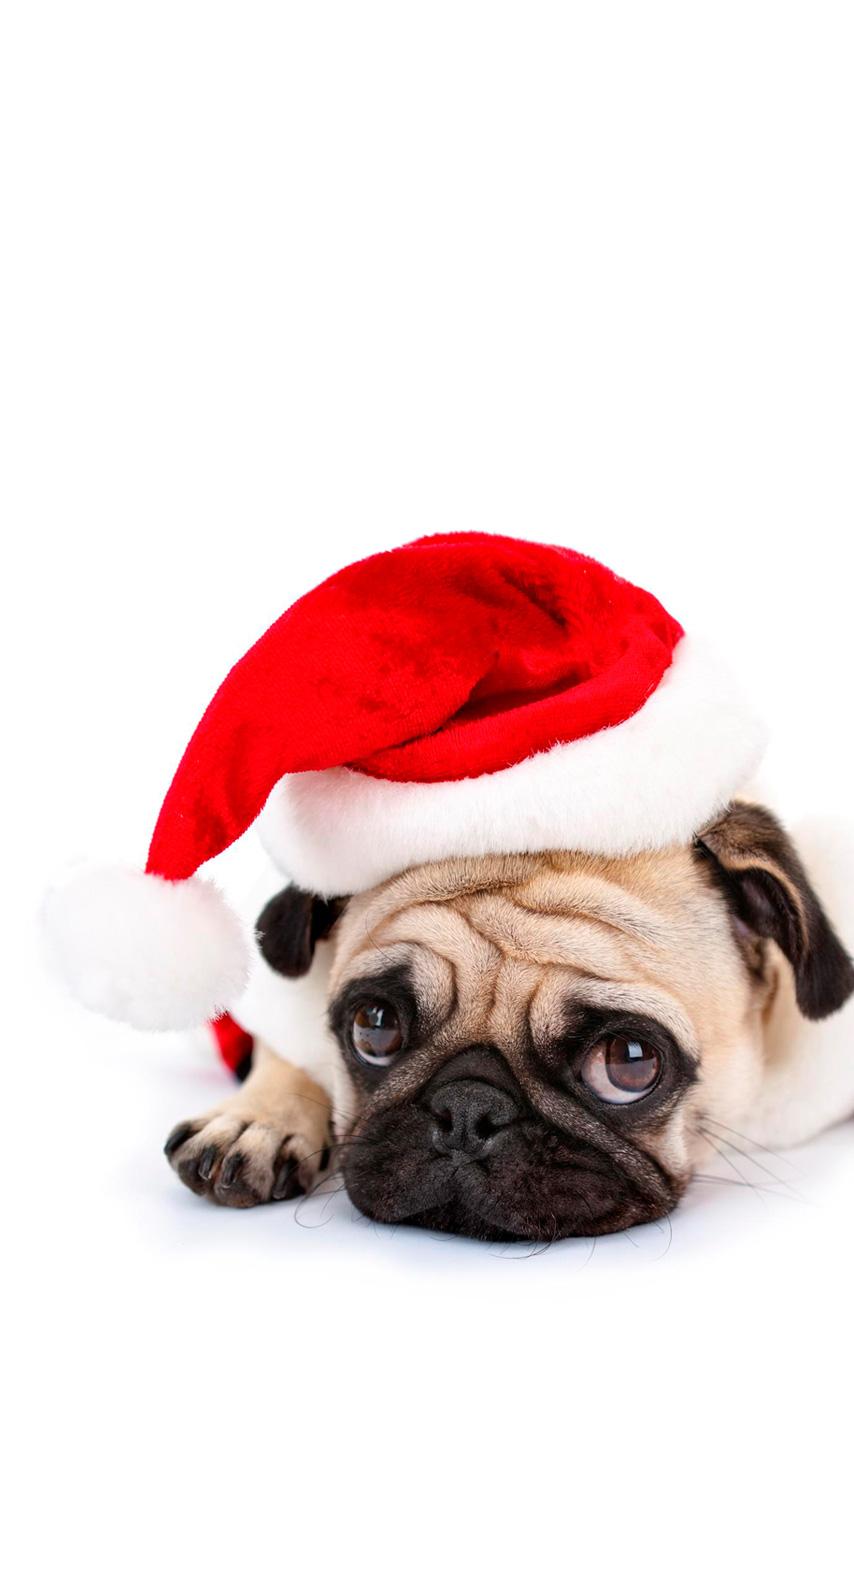 pug, breed, wrinkle, purebred, boxer, bulldog, pedigree, snout, carnivoran, dog like mammal, dog breed, puppy love, companion dog, toy dog, fawn, dog clothes